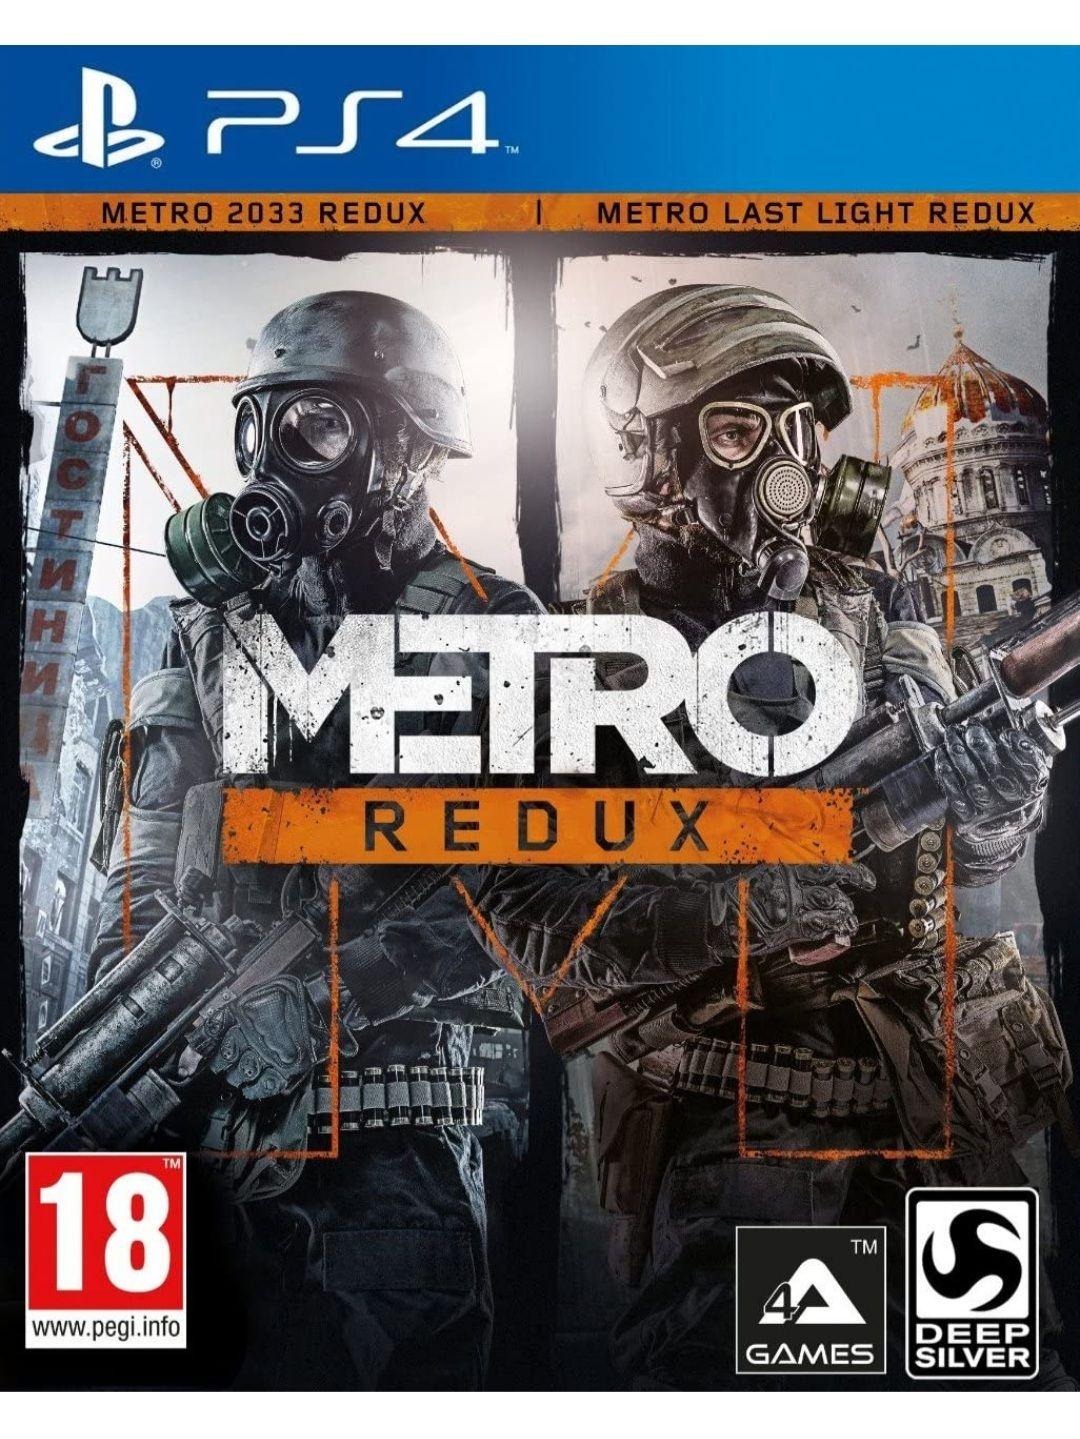 Metro Redux Double Pack (2033 + Last Light) - PS4